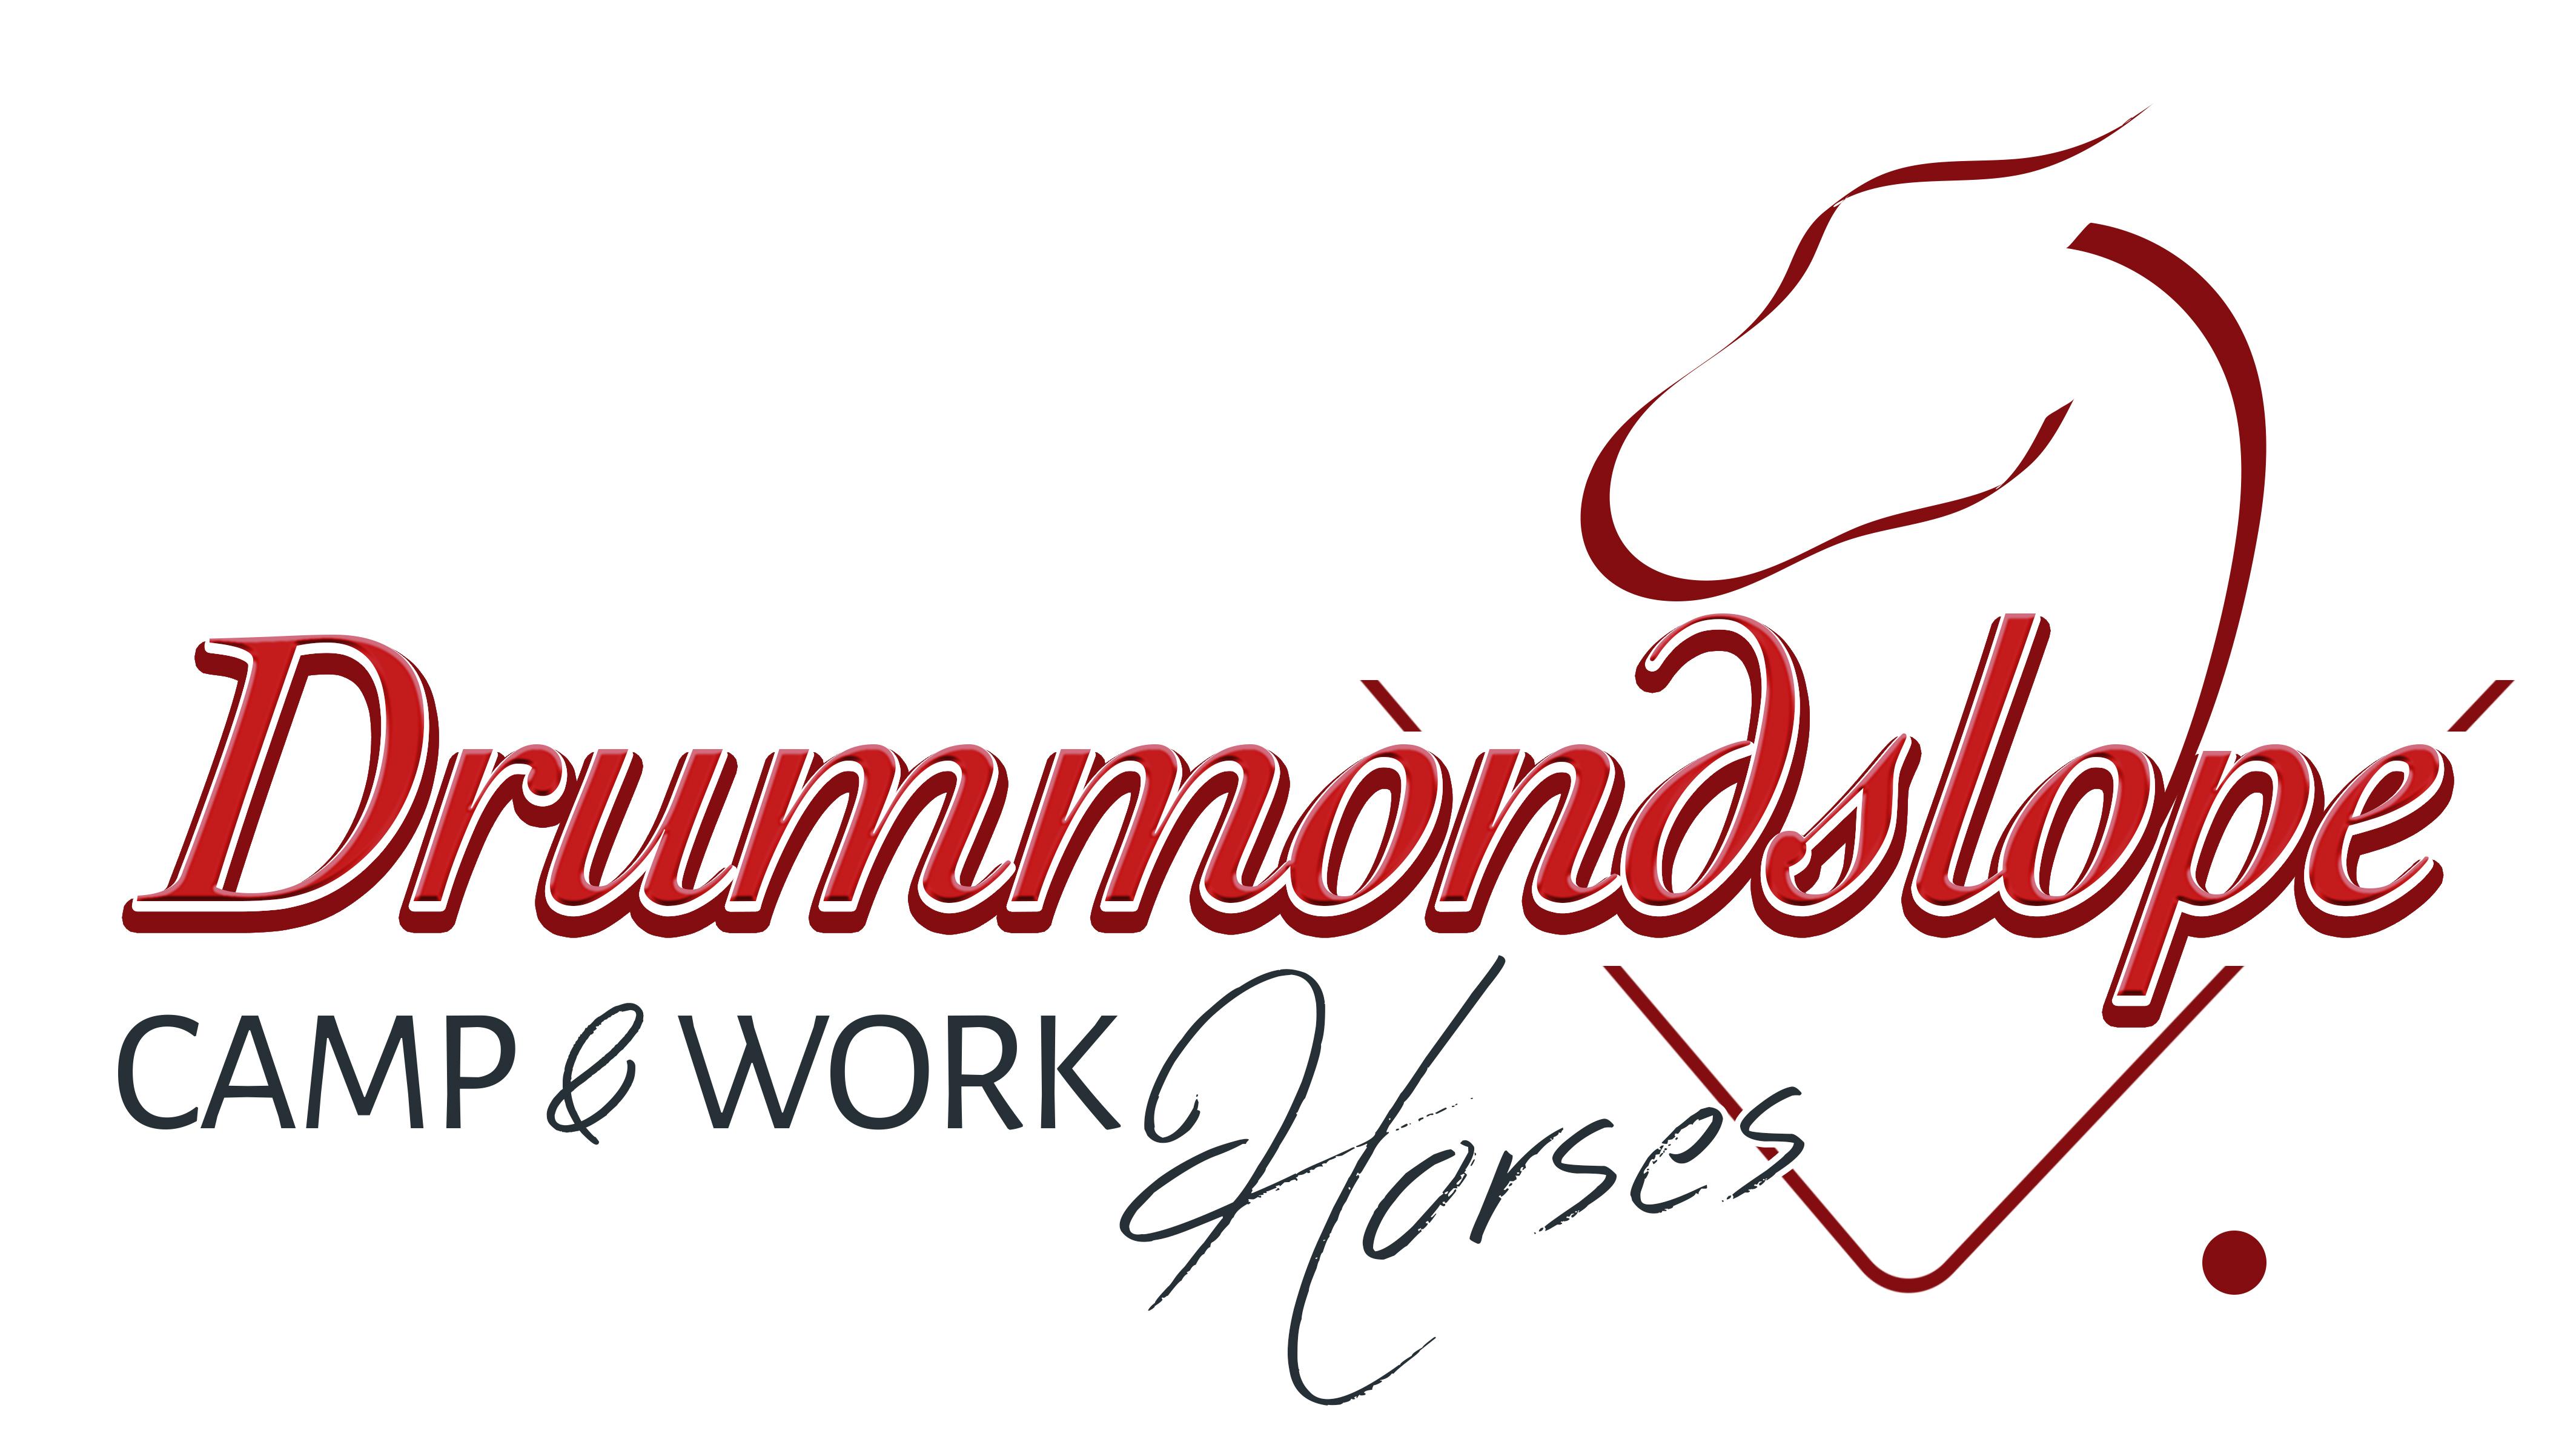 Drummondslope Logo